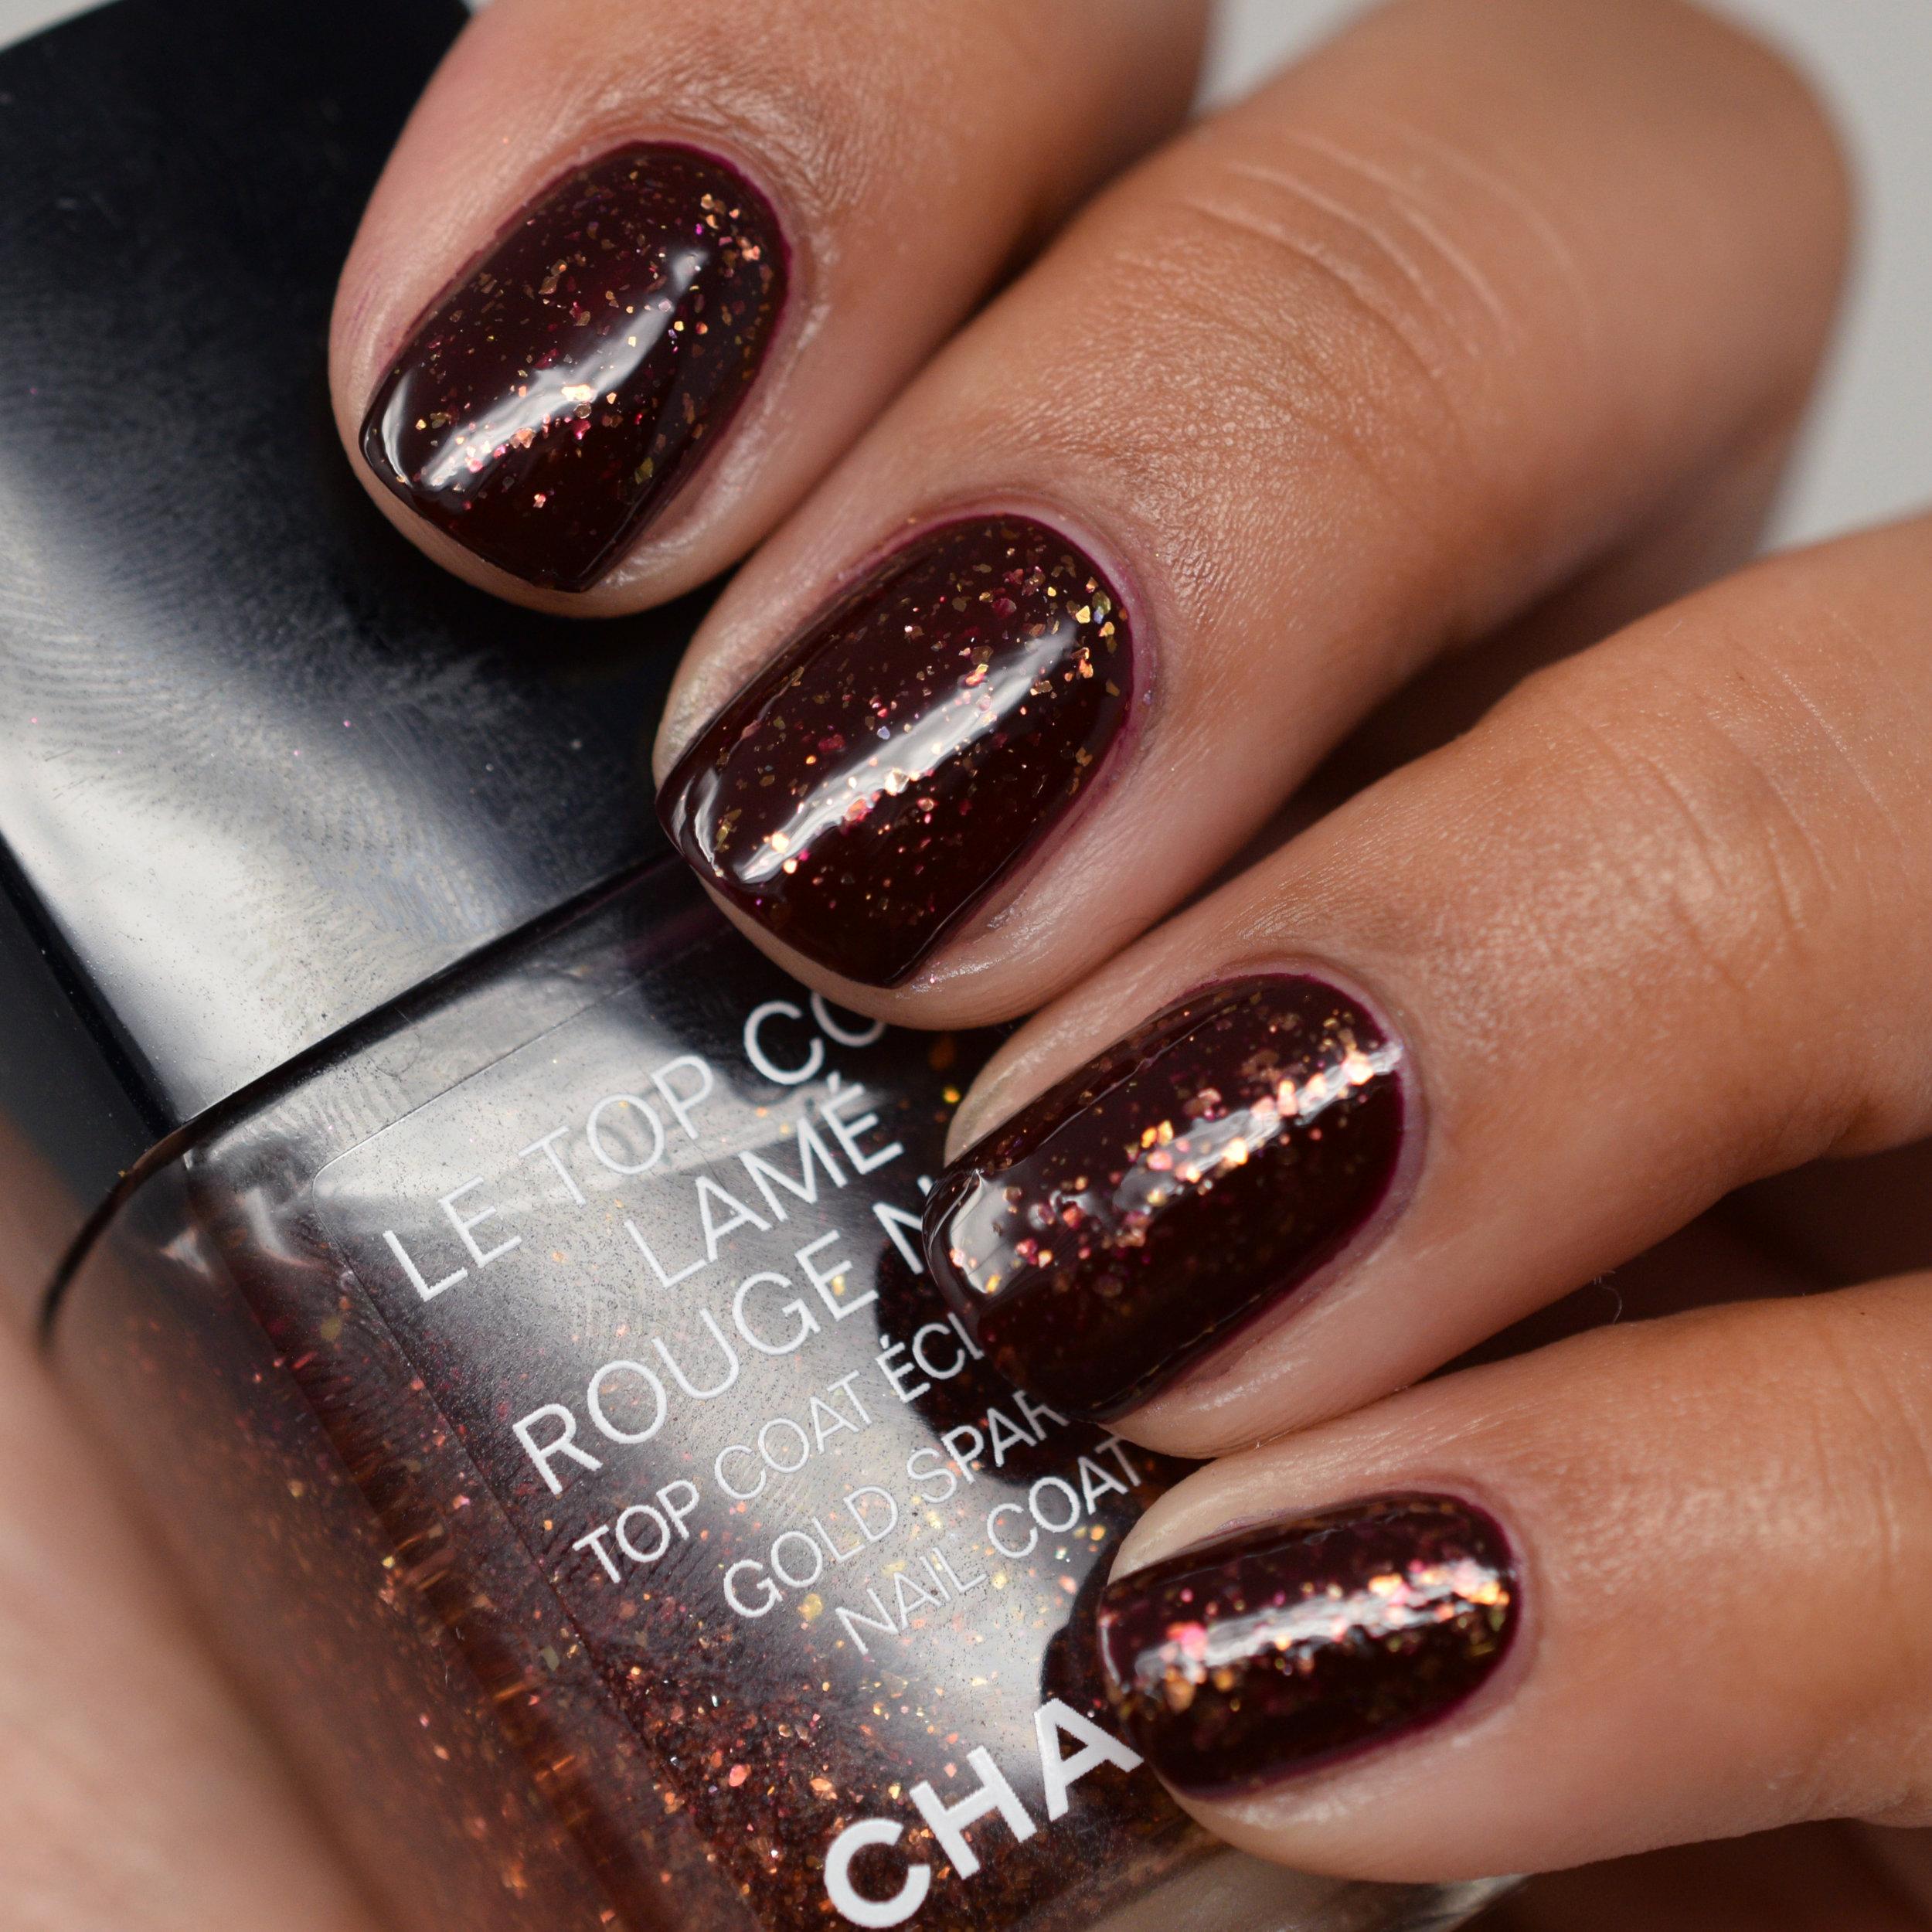 Chanel Le Top Coat Lame Rouge over Rouge Noir.jpg